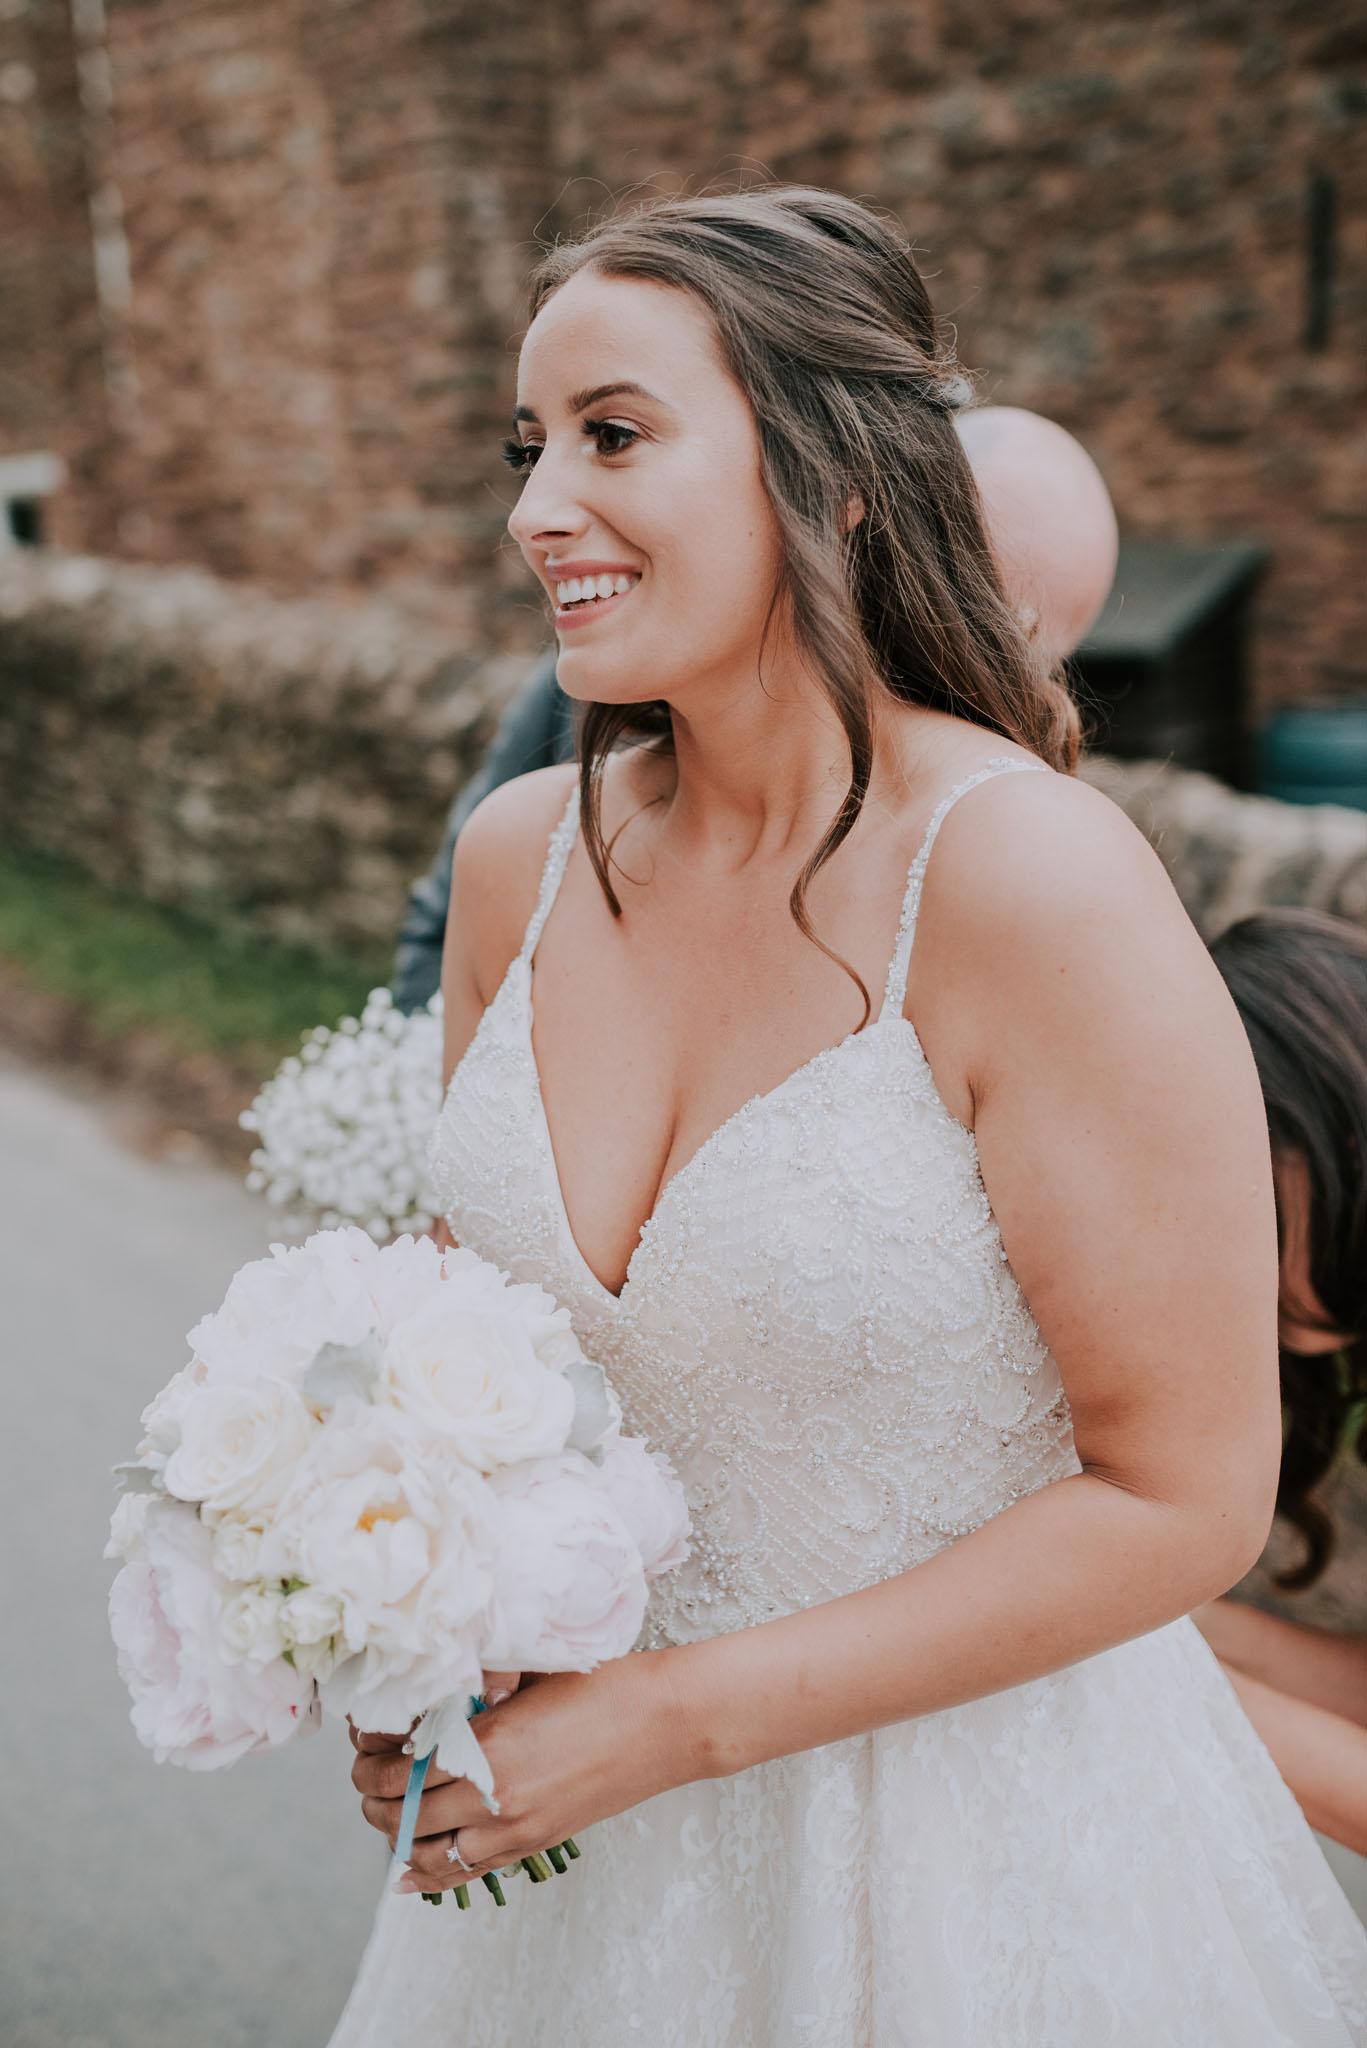 wedding-photographer-glewstone-court-hereford-scott-stockwell-photography136.jpg